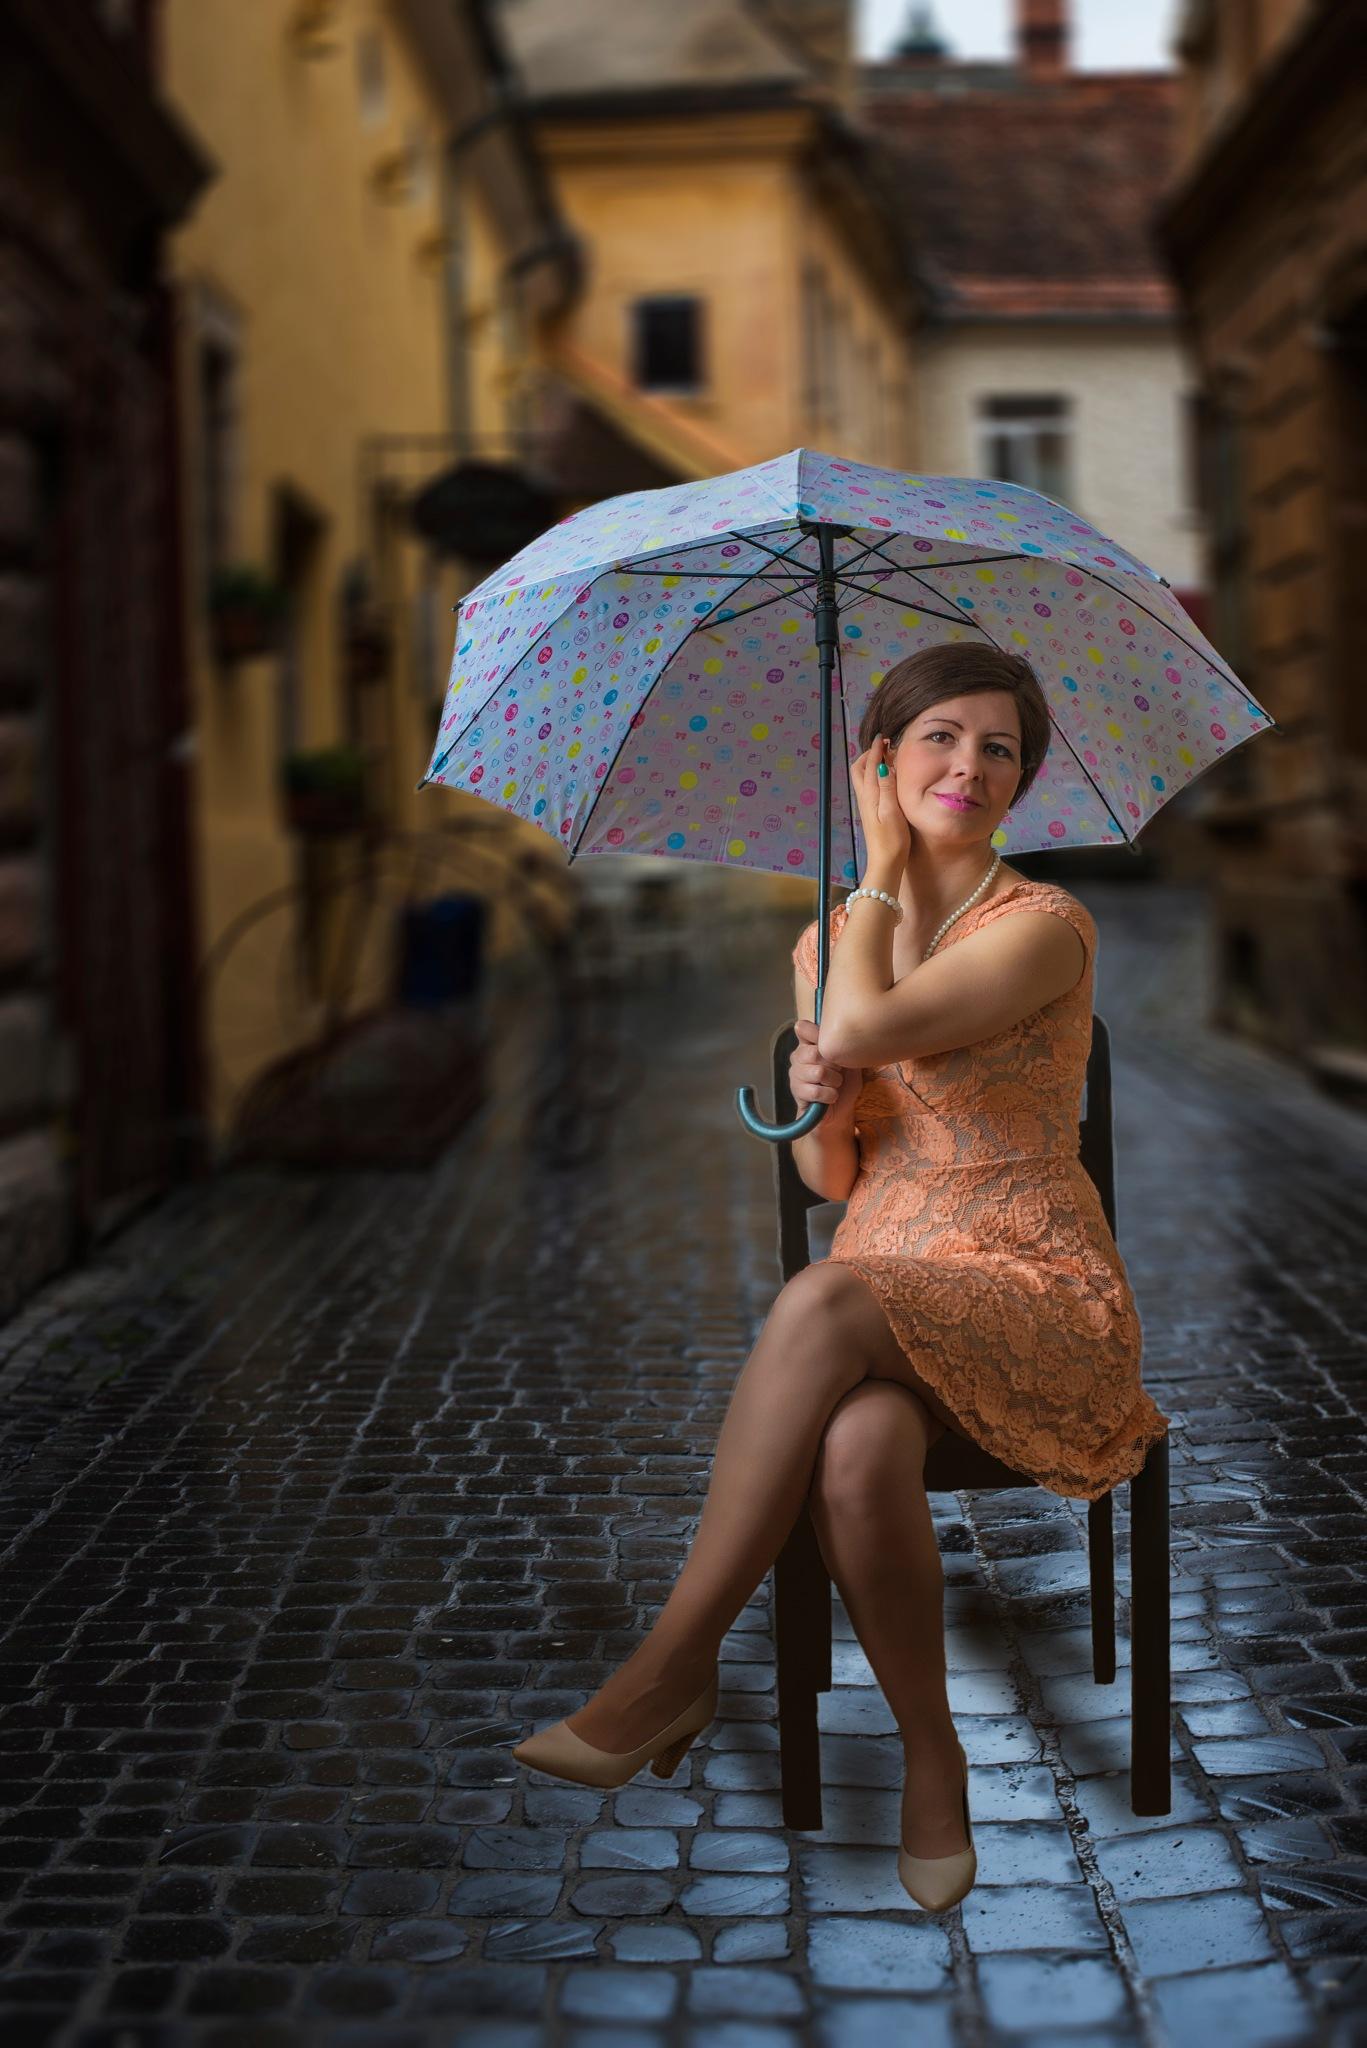 rain by colisniuc sorin-valerian